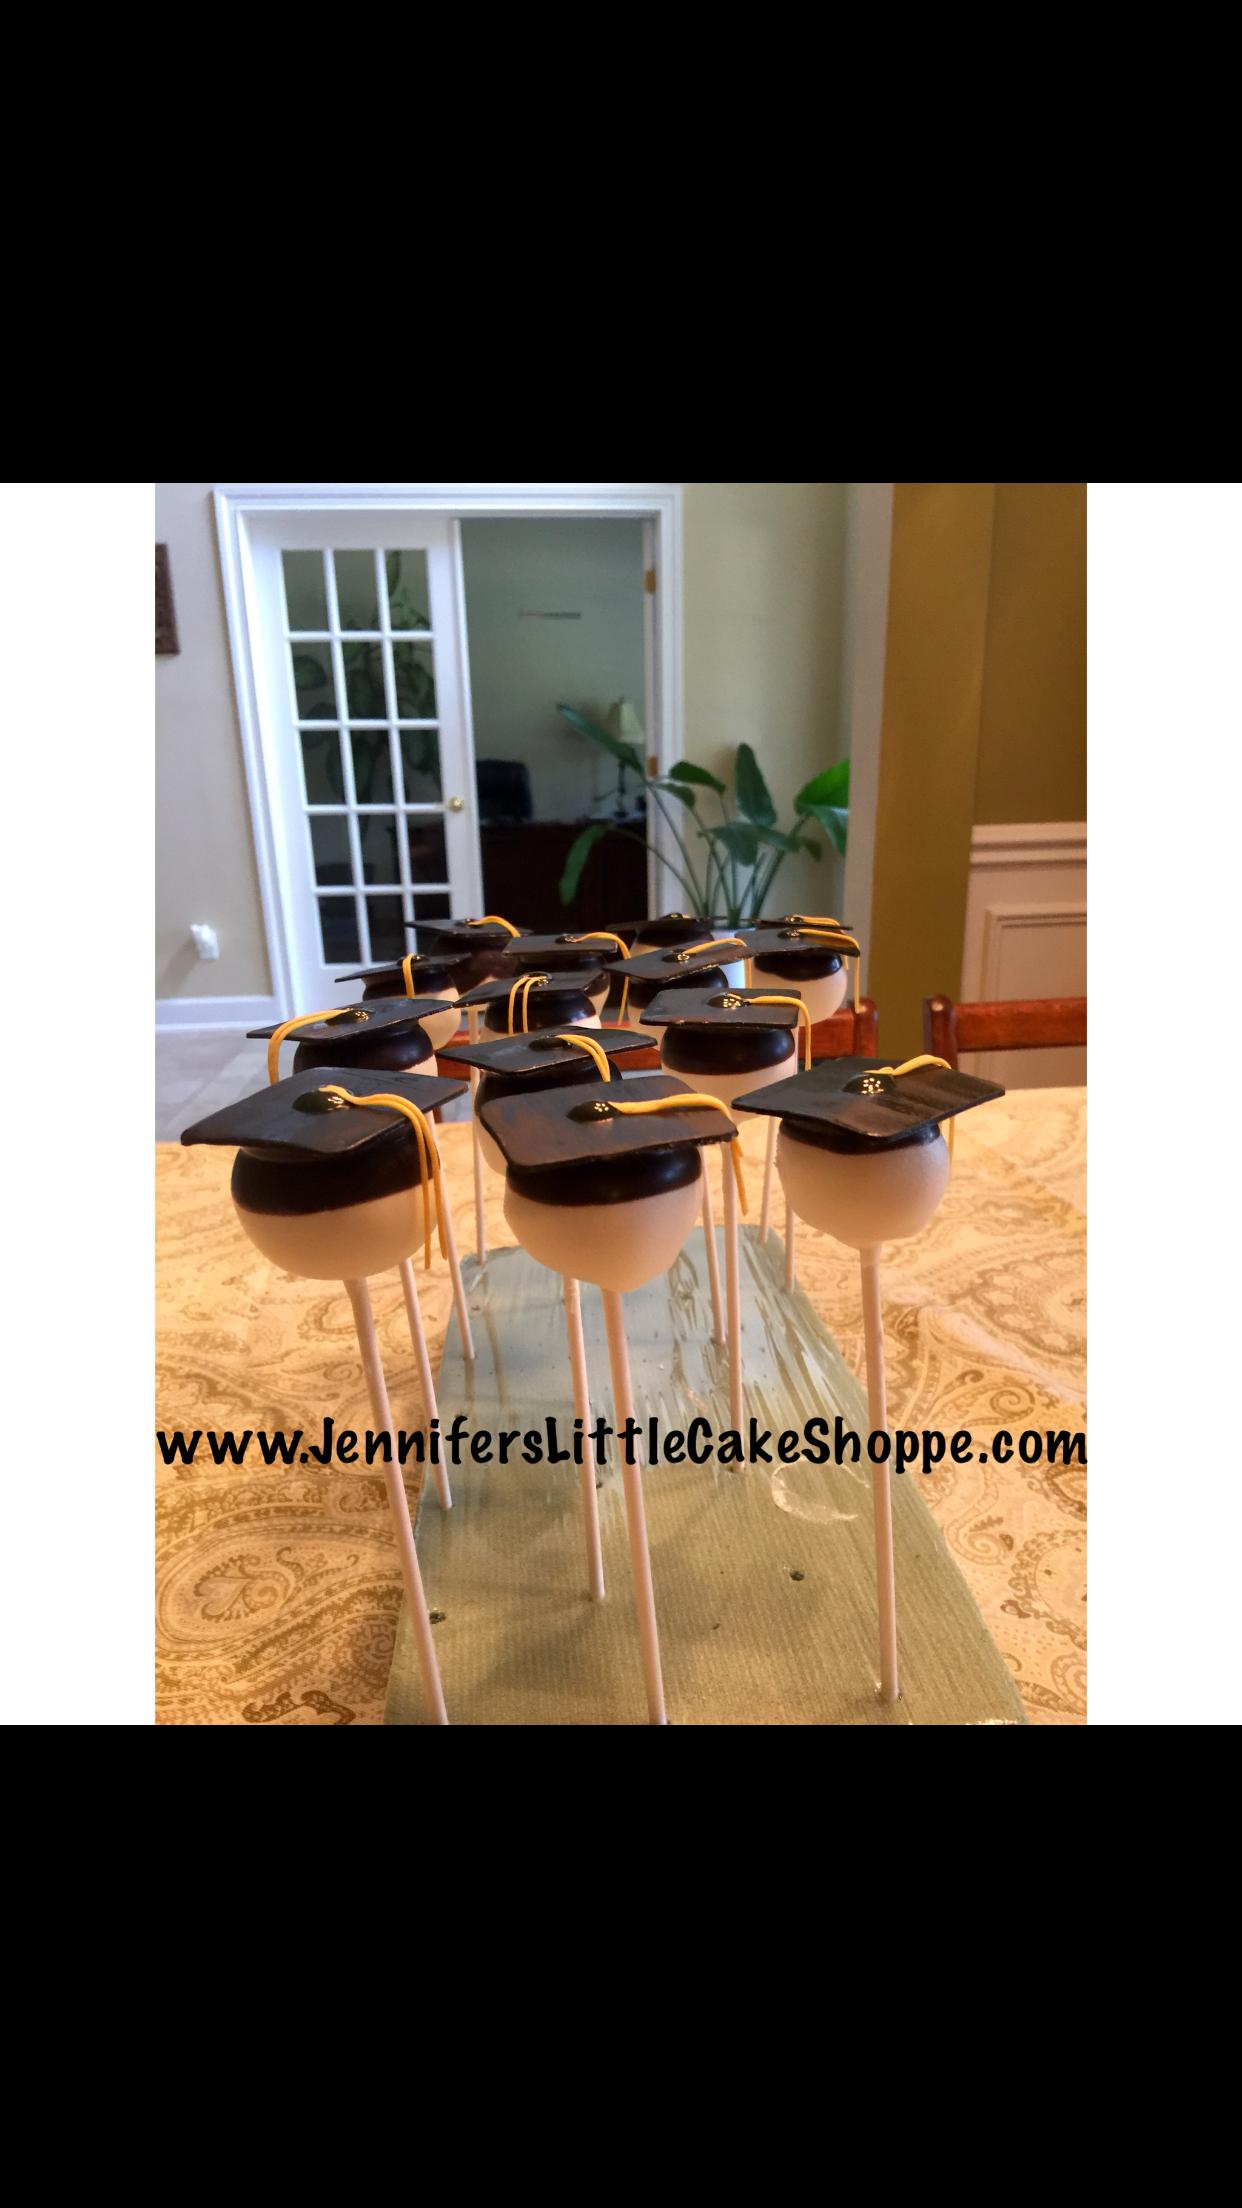 Graduation cap cake pops from Jennifer's Little Cake